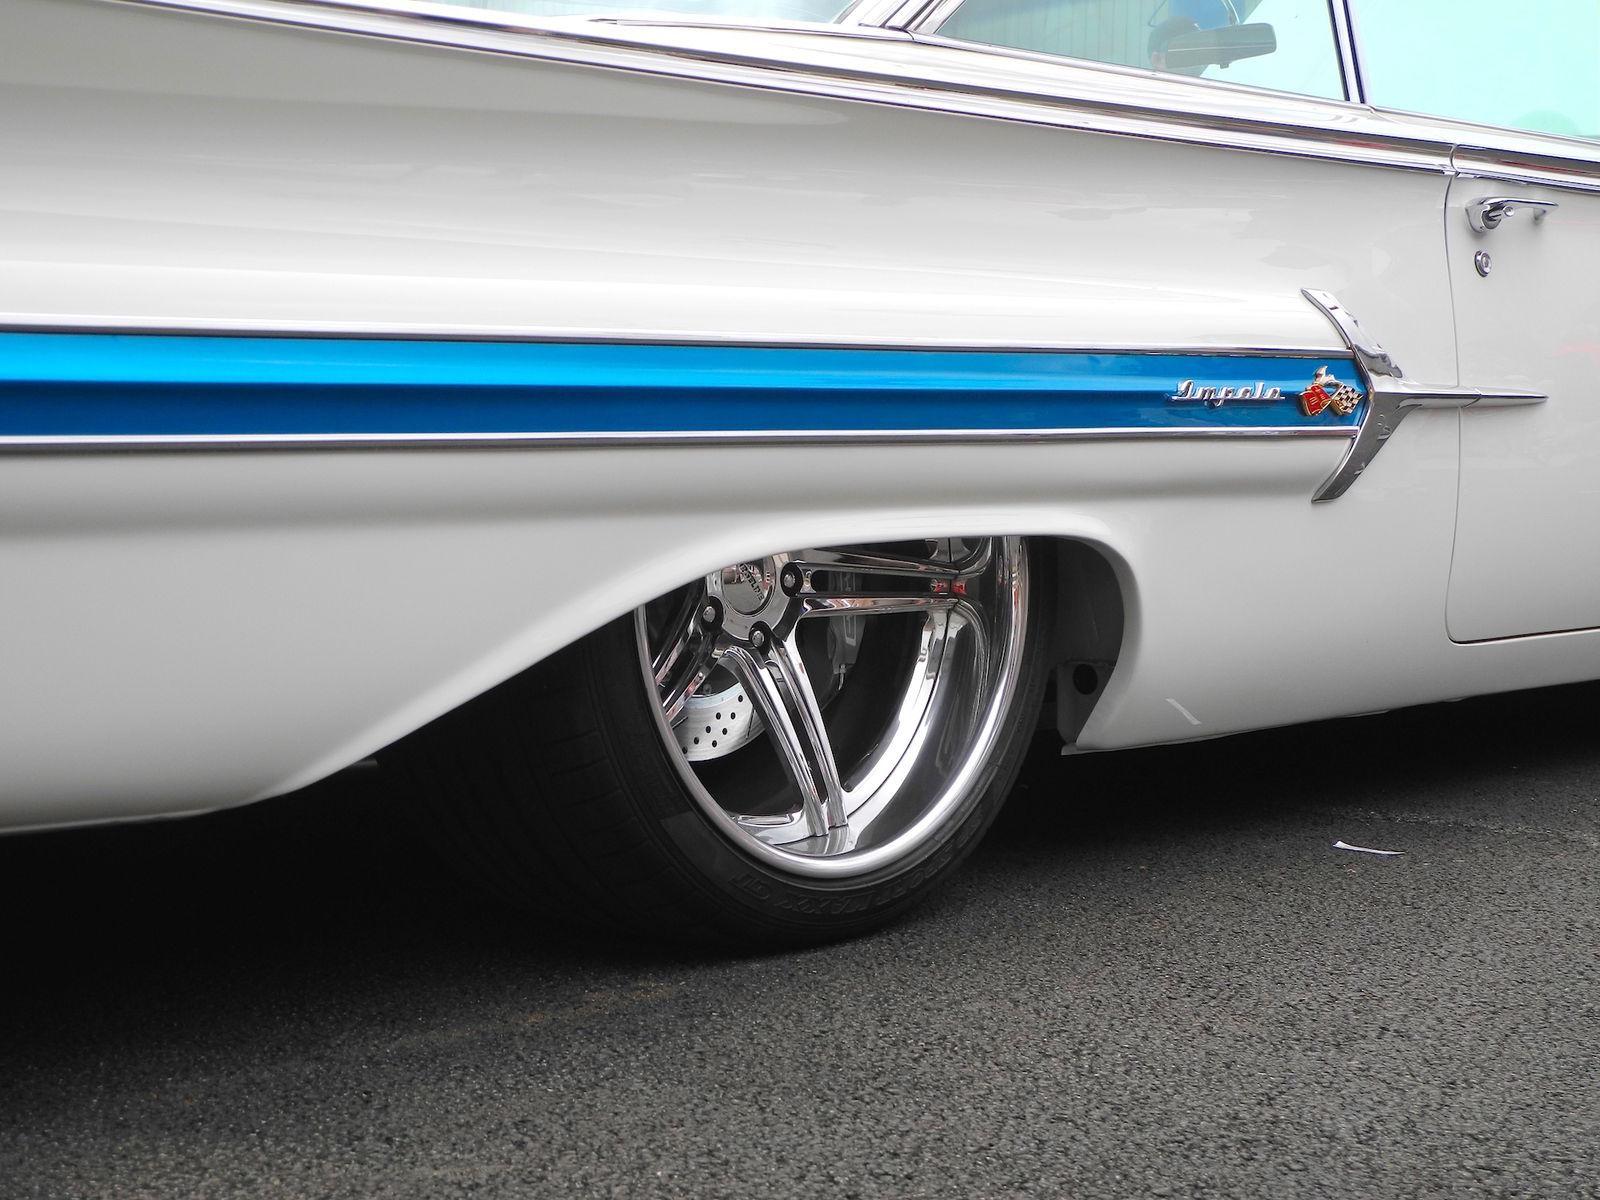 1960 Chevrolet Impala | Tony's '60 Impala on Forgeline SC3C Concave Wheels